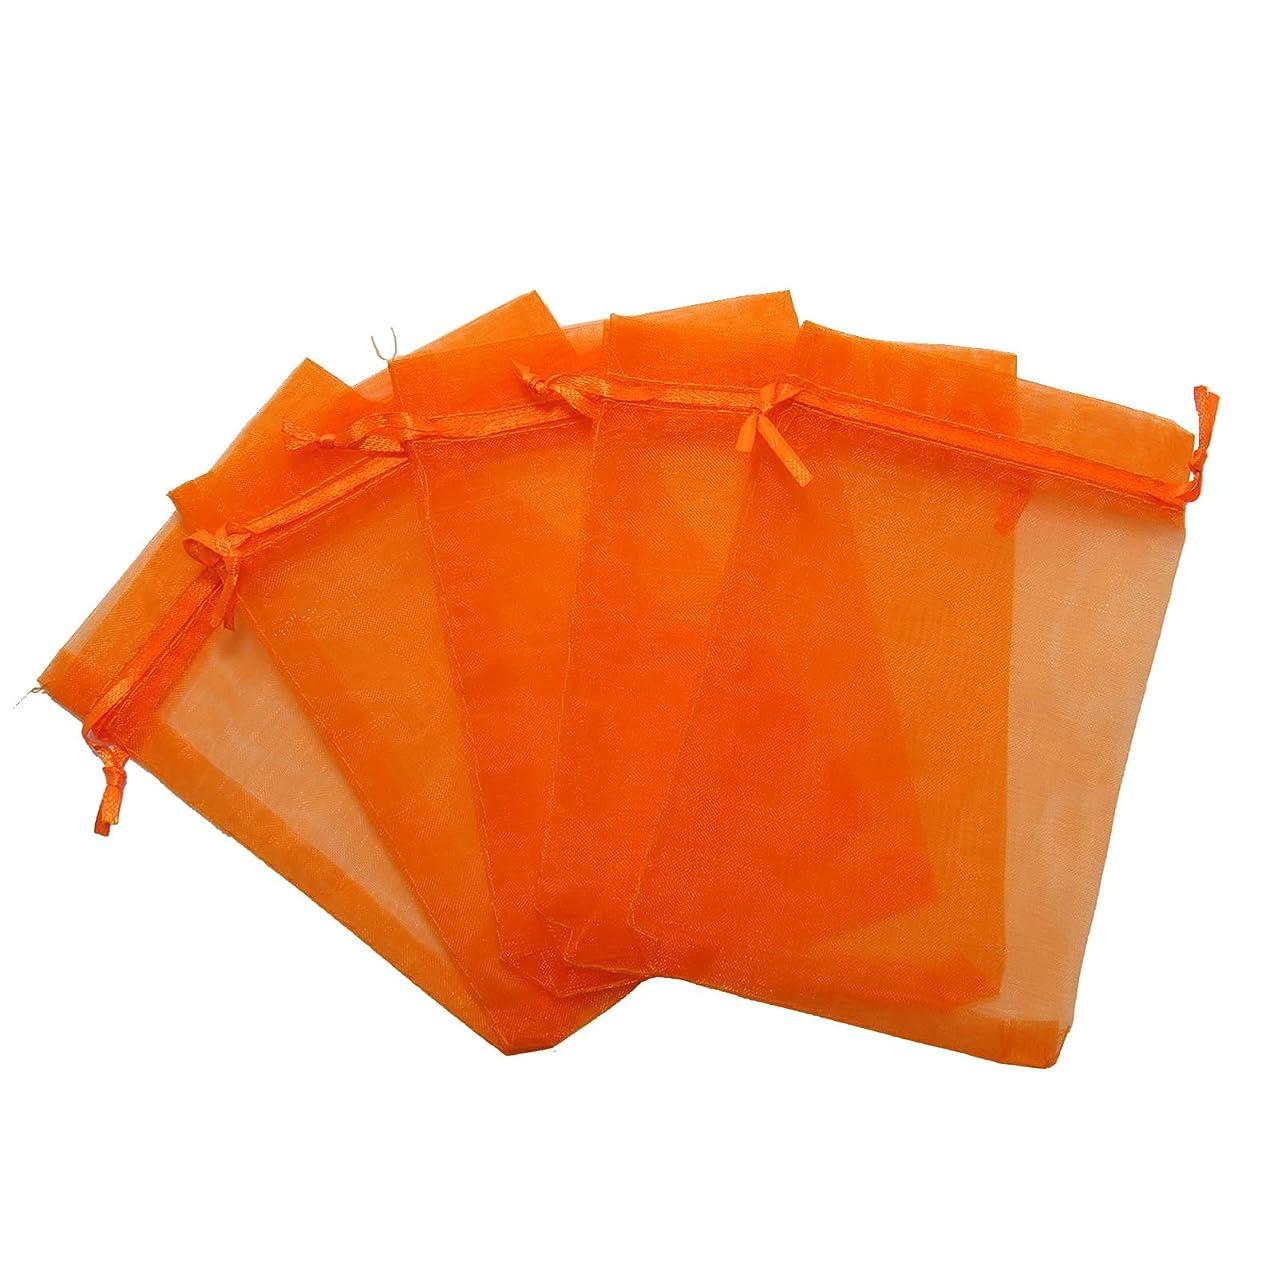 RakrisaSupplies 100Pcs Orange Organza Bags 8x12